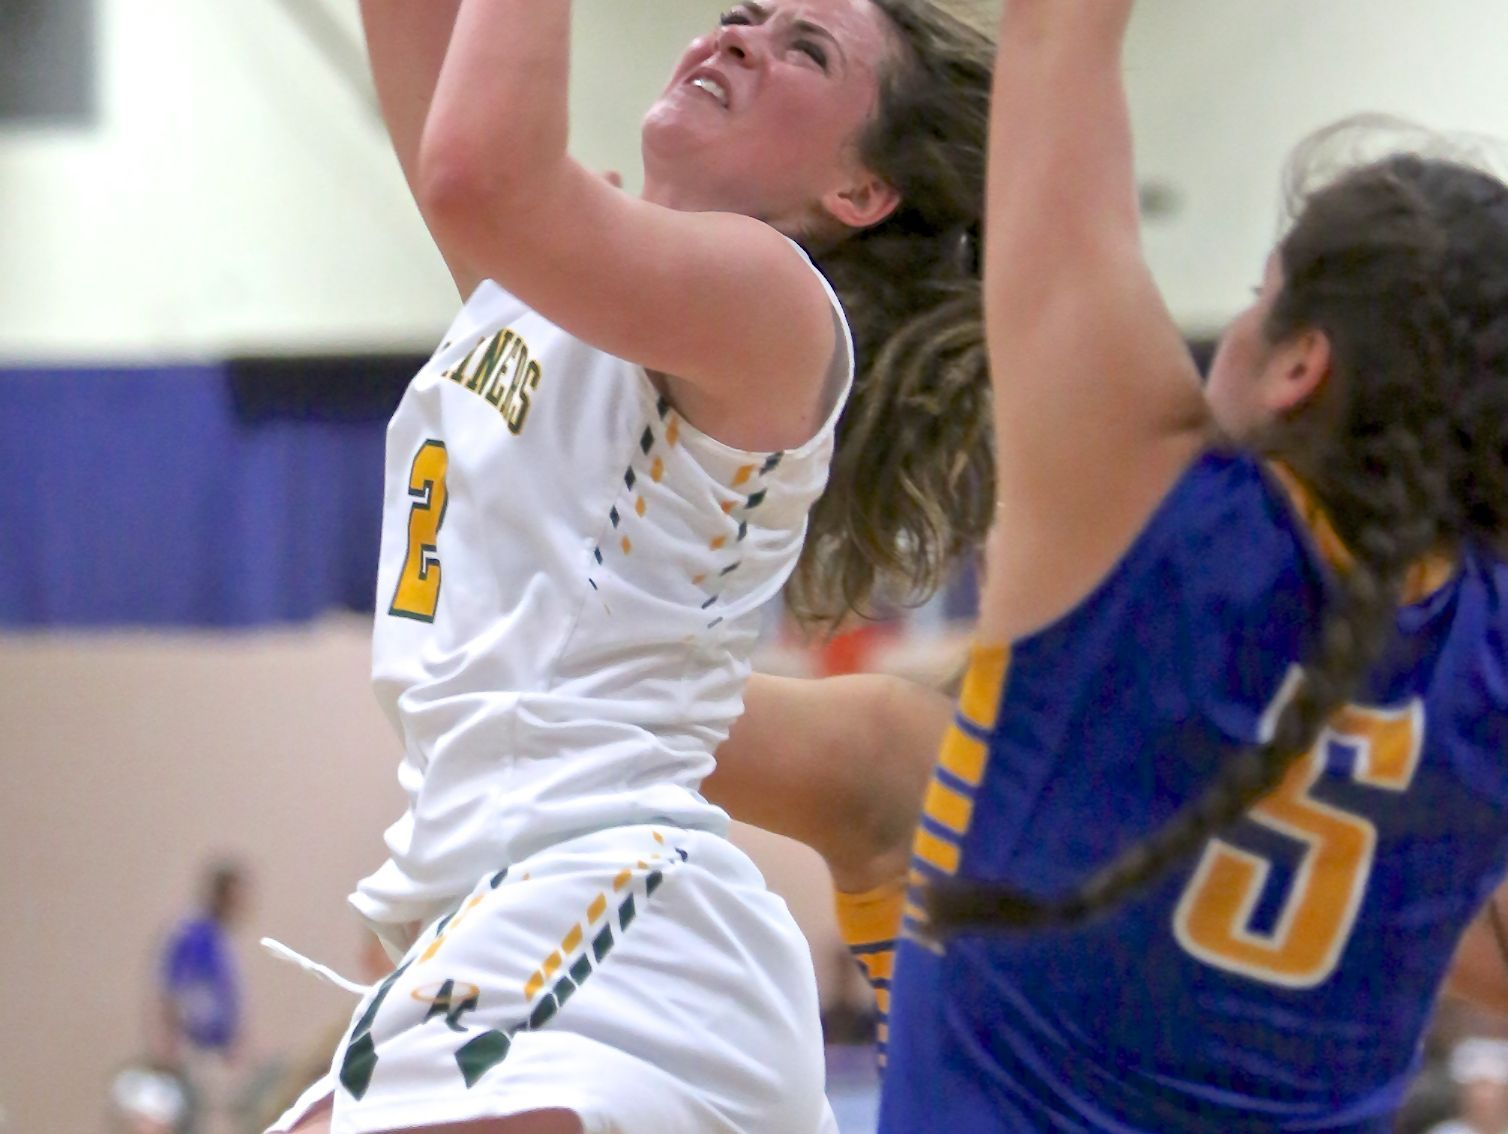 Bishop Manogue beat Reed, 62-45, Friday at Carson in a Northern 4A girls basketball semifinal game.